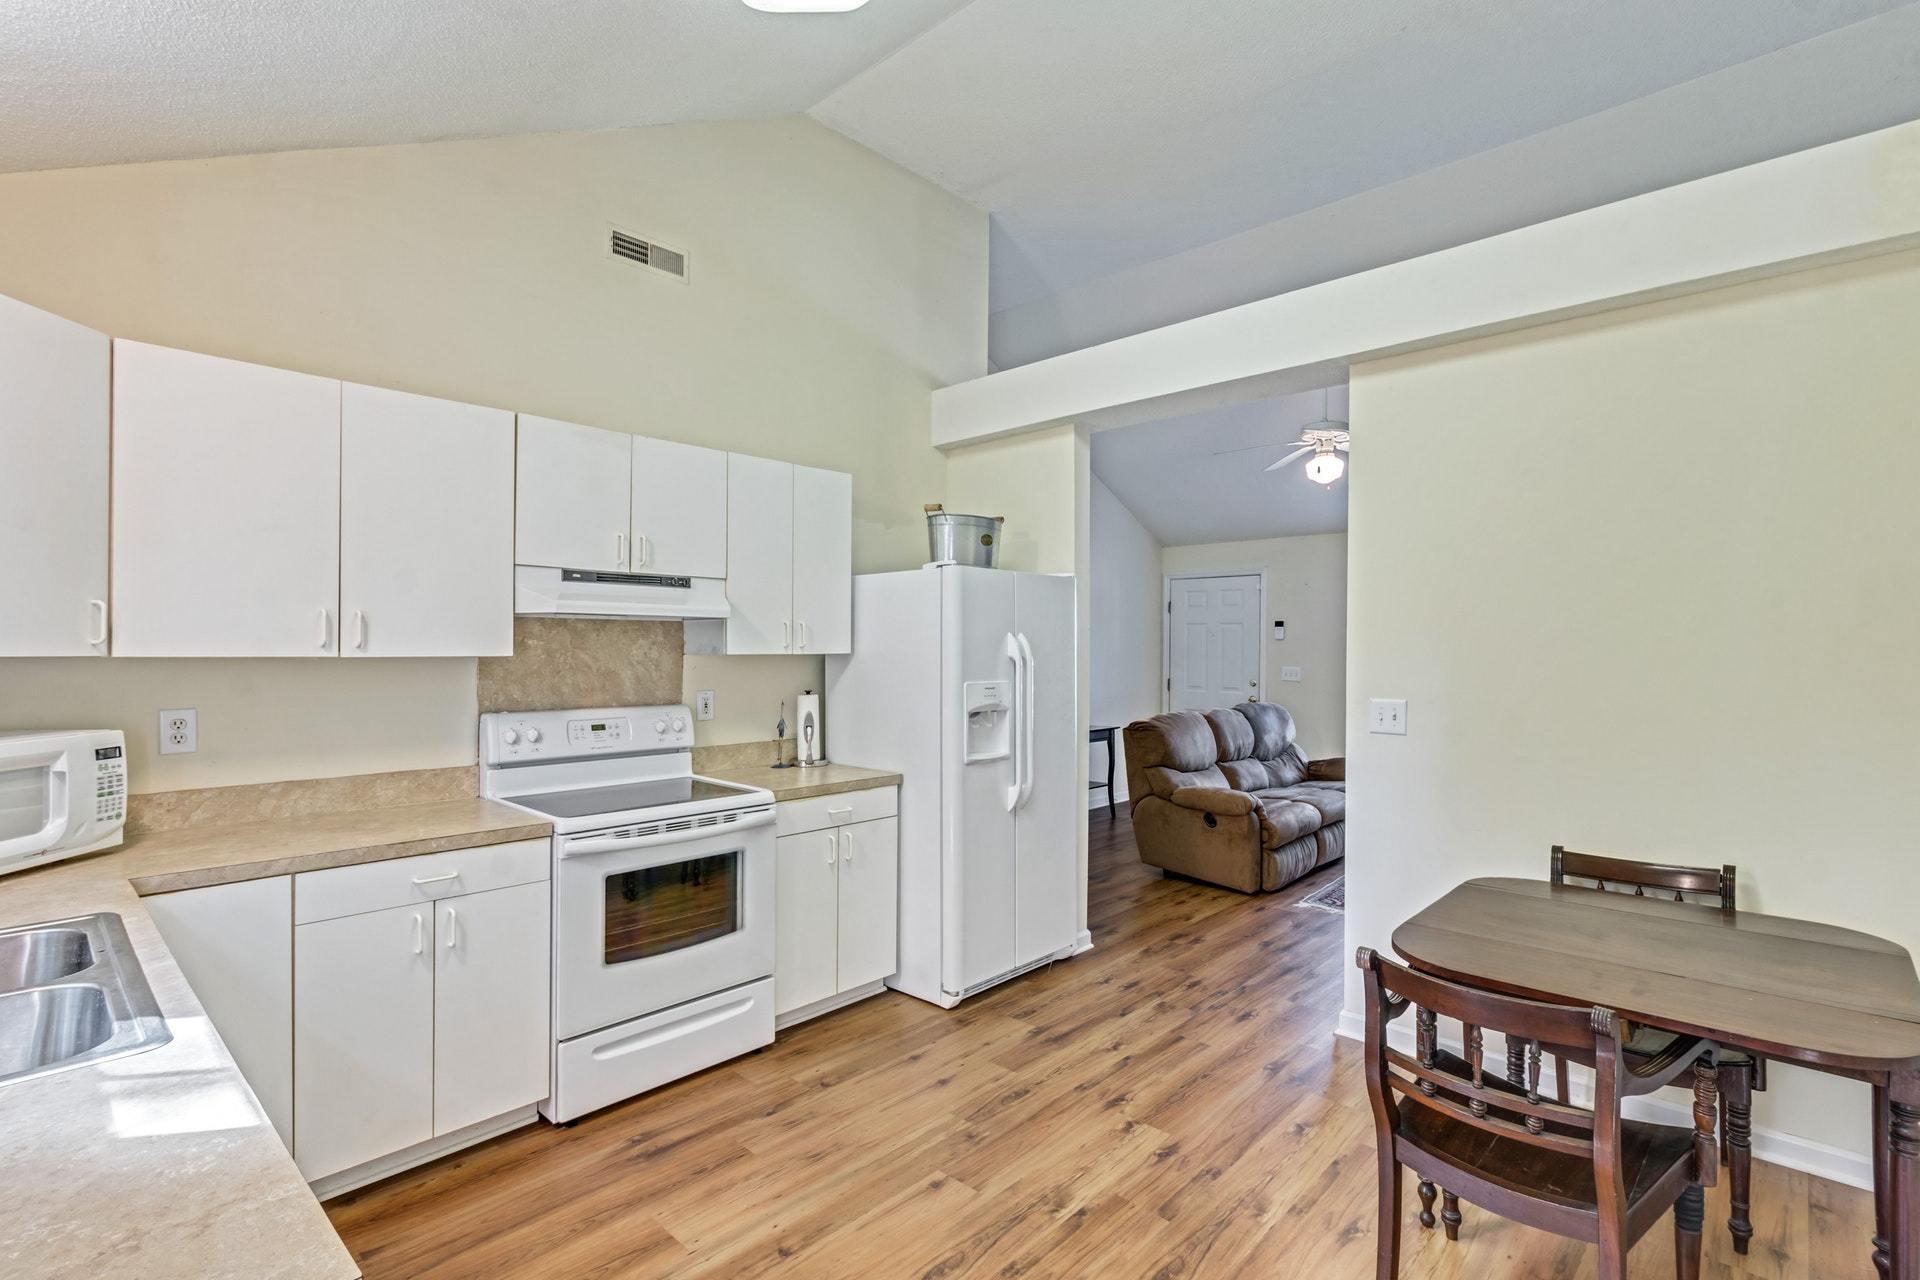 Double Oaks Homes For Sale - 2402 Double Oak, Charleston, SC - 7